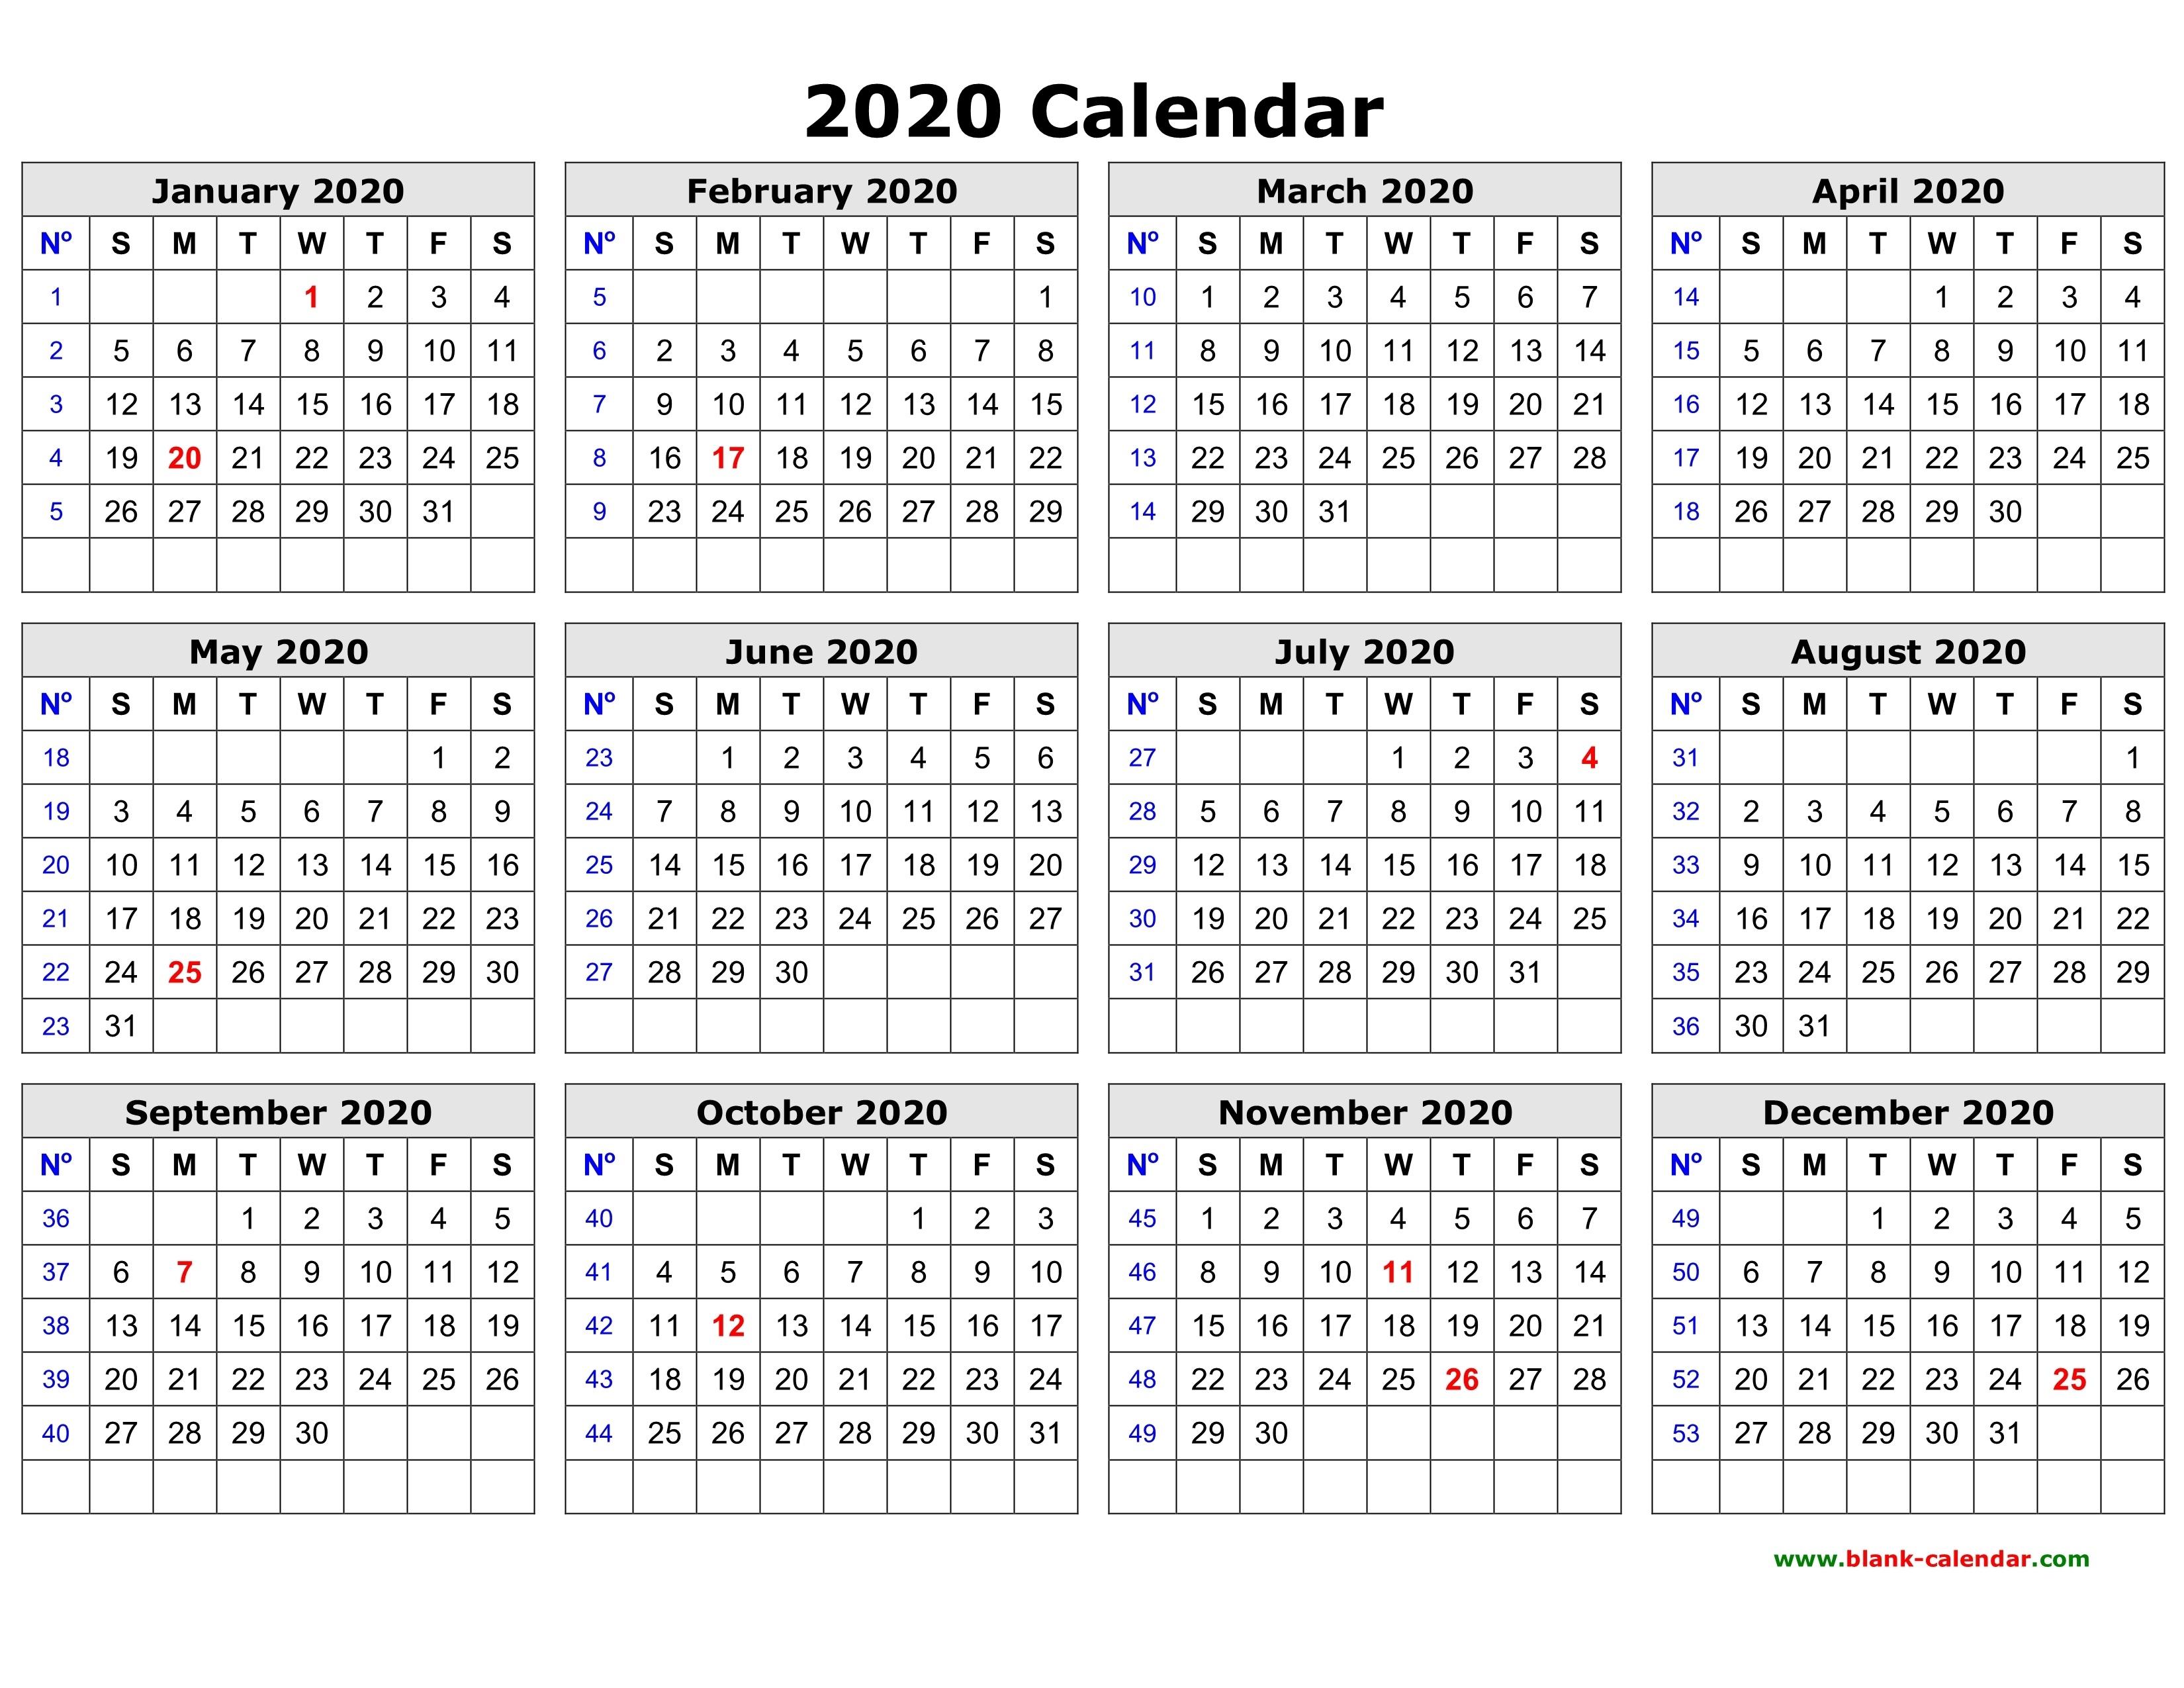 Blank Calendar Excel 2020 | Calendar Template Information